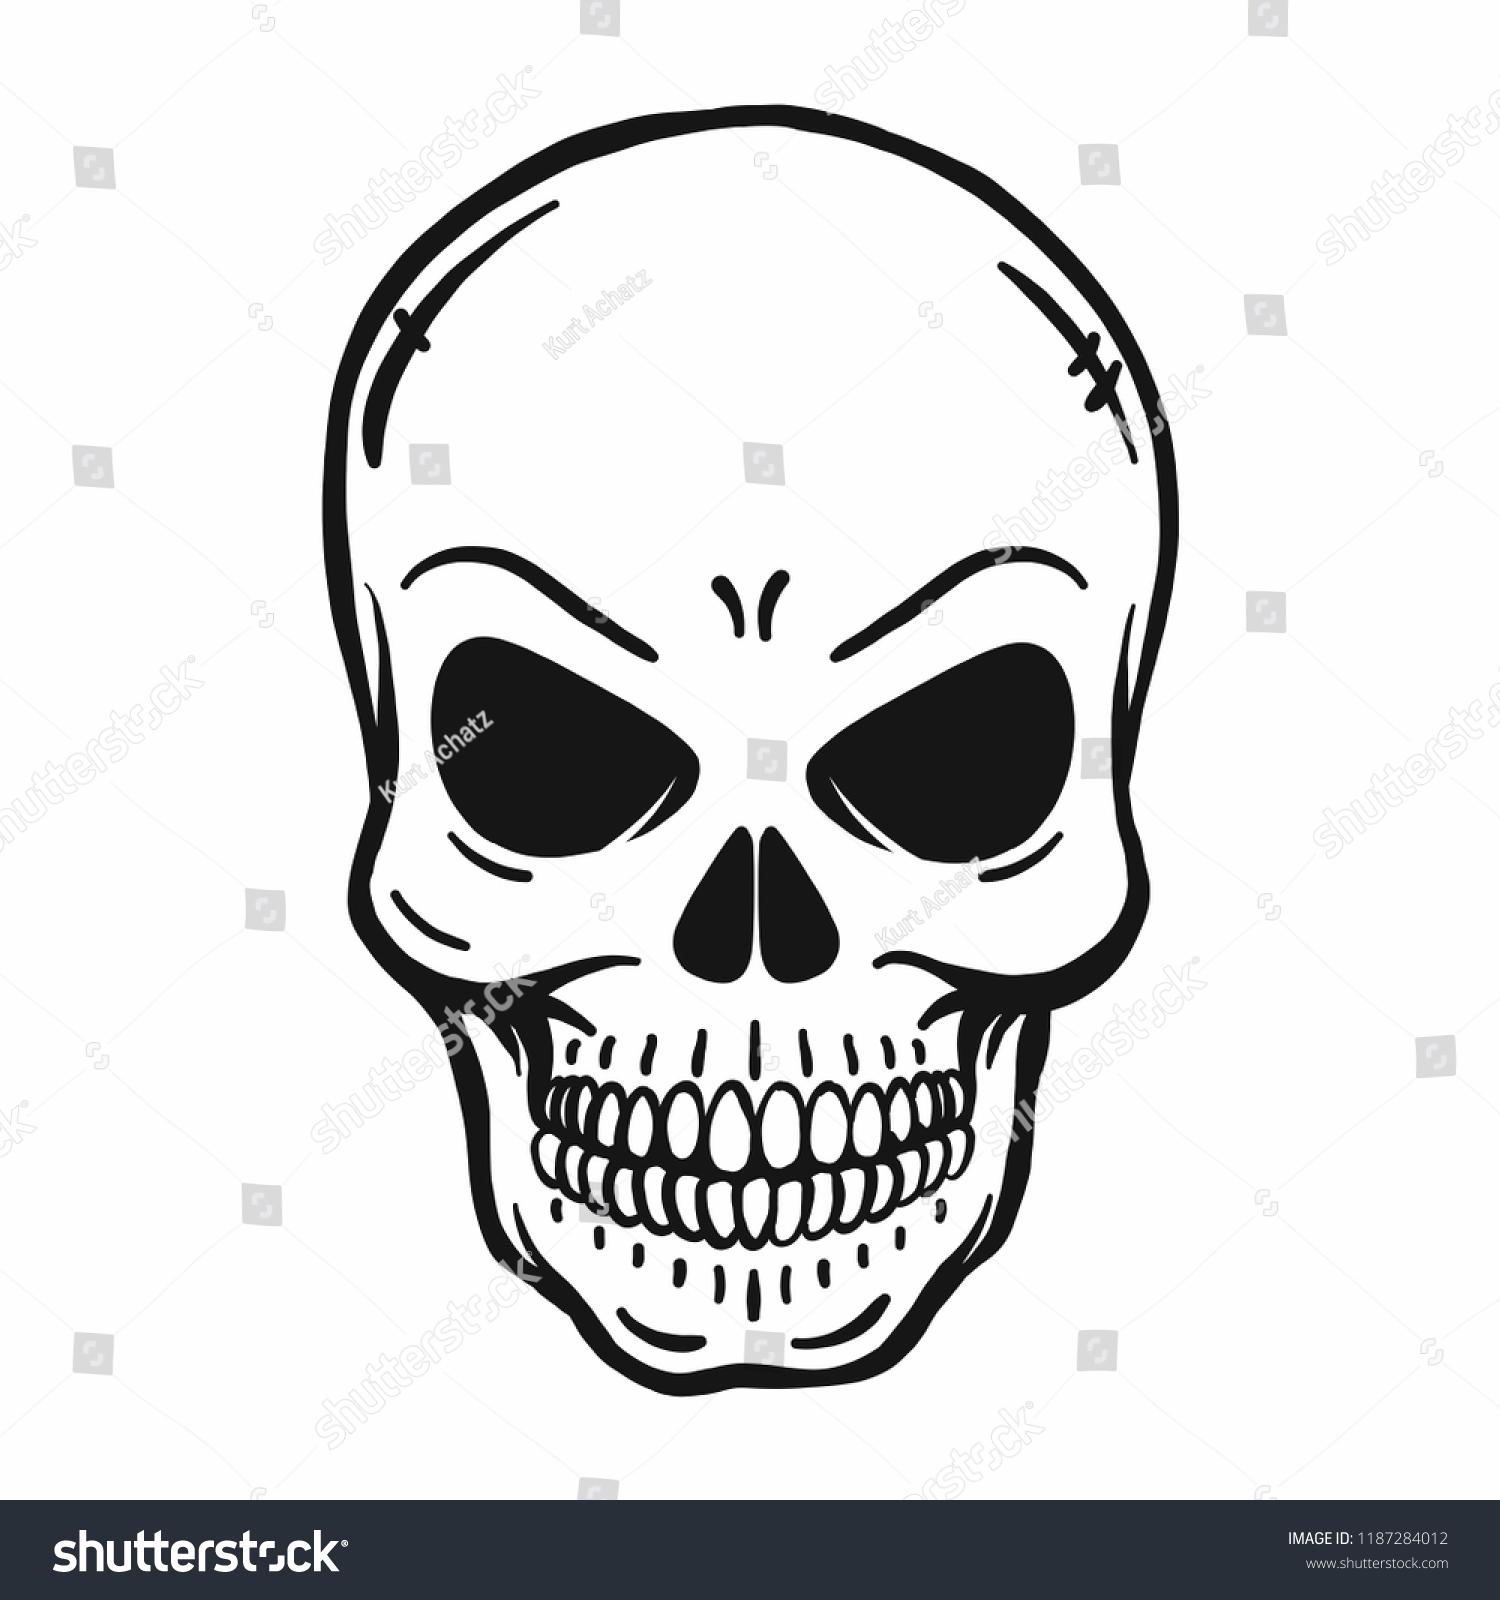 Skull Outline Vector Images Stock Photos Vectors Shutterstock